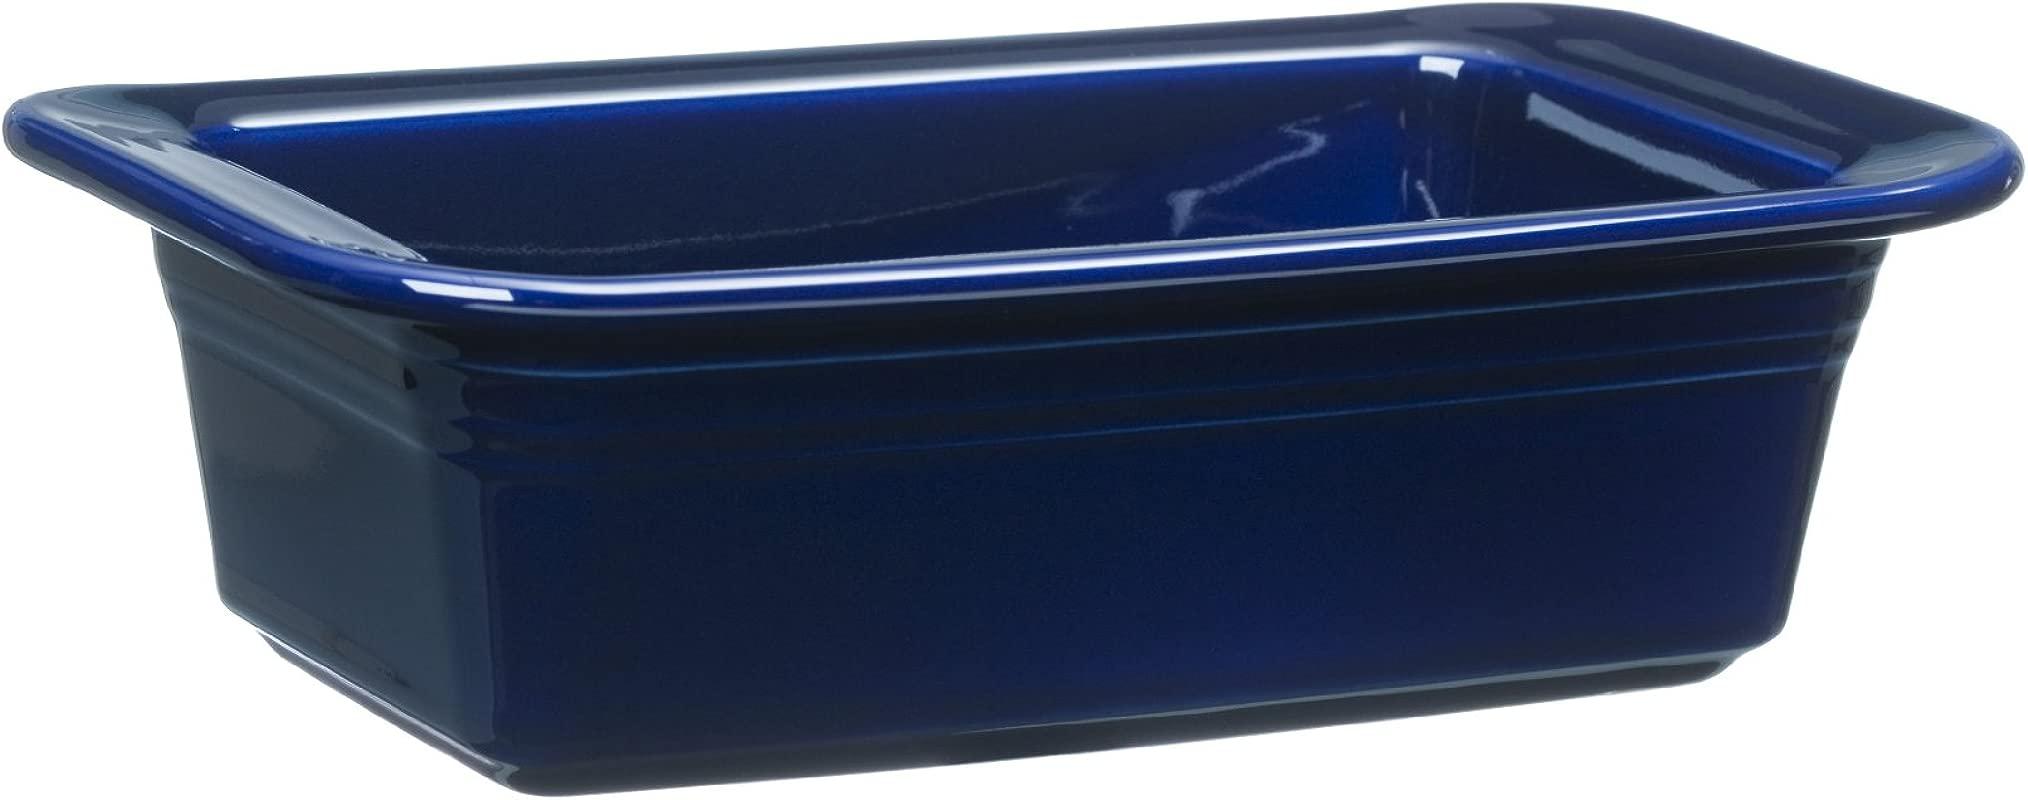 Fiesta 813 105 Loaf Pan 5 3 4 Inch By 10 3 4 Inch Cobalt